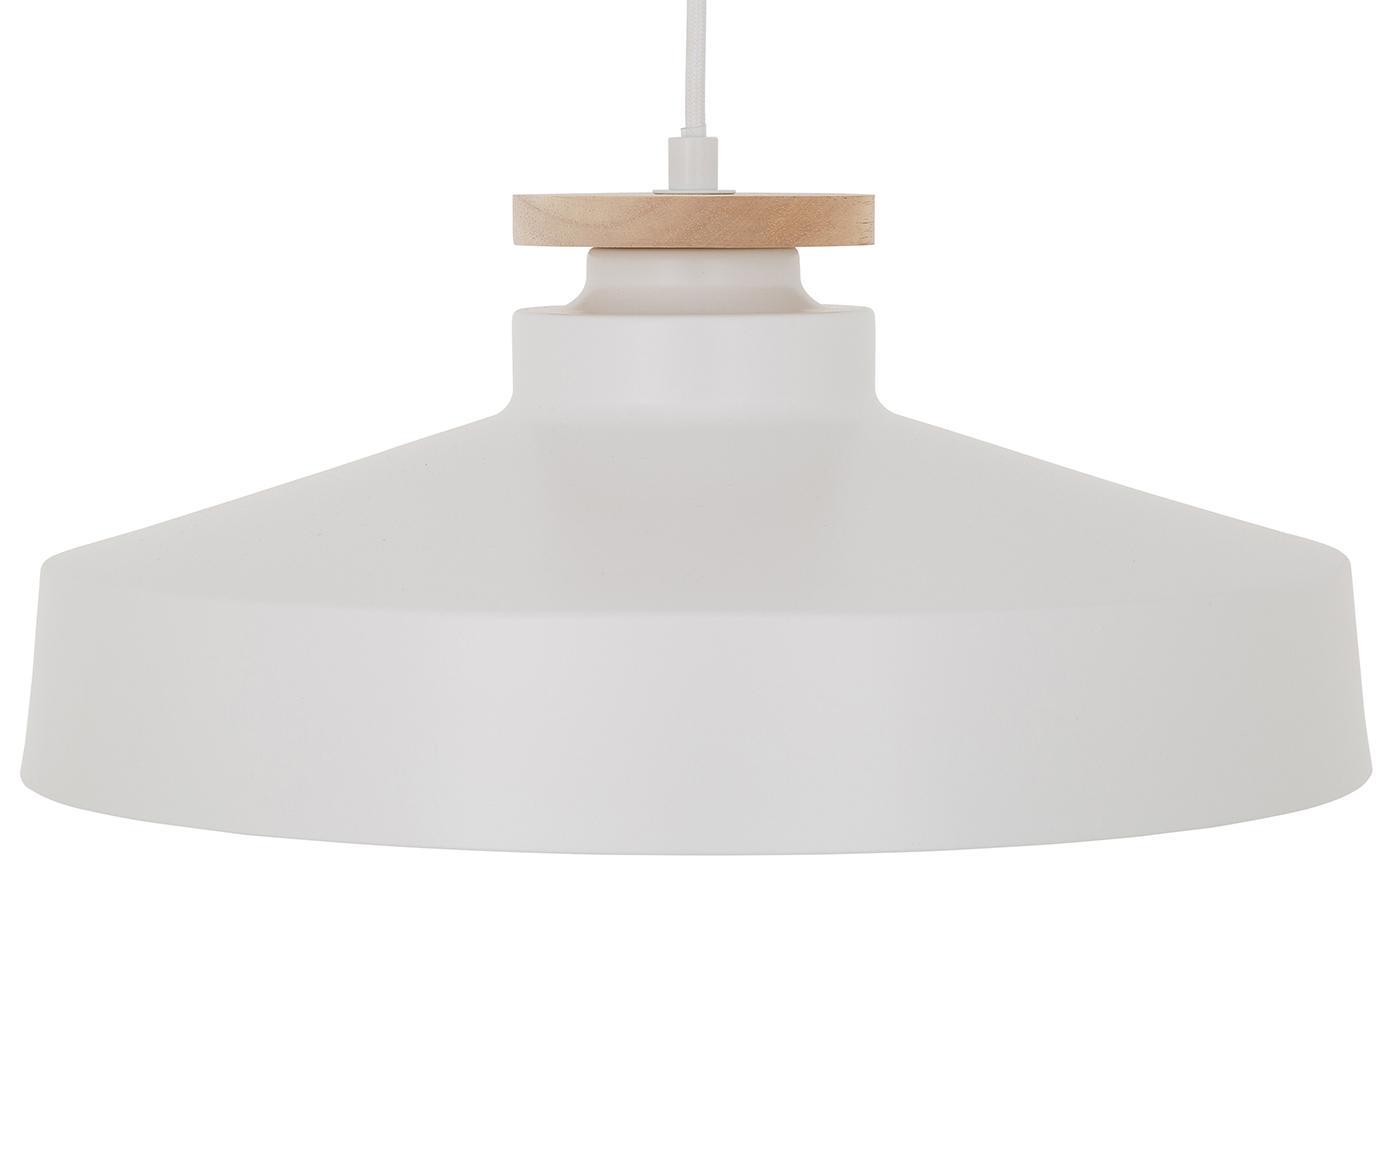 Scandi hanglamp Malm, Lampenkap: metaal, hout, Baldakijn: metaal, Wit, Ø 40 x H 20 cm